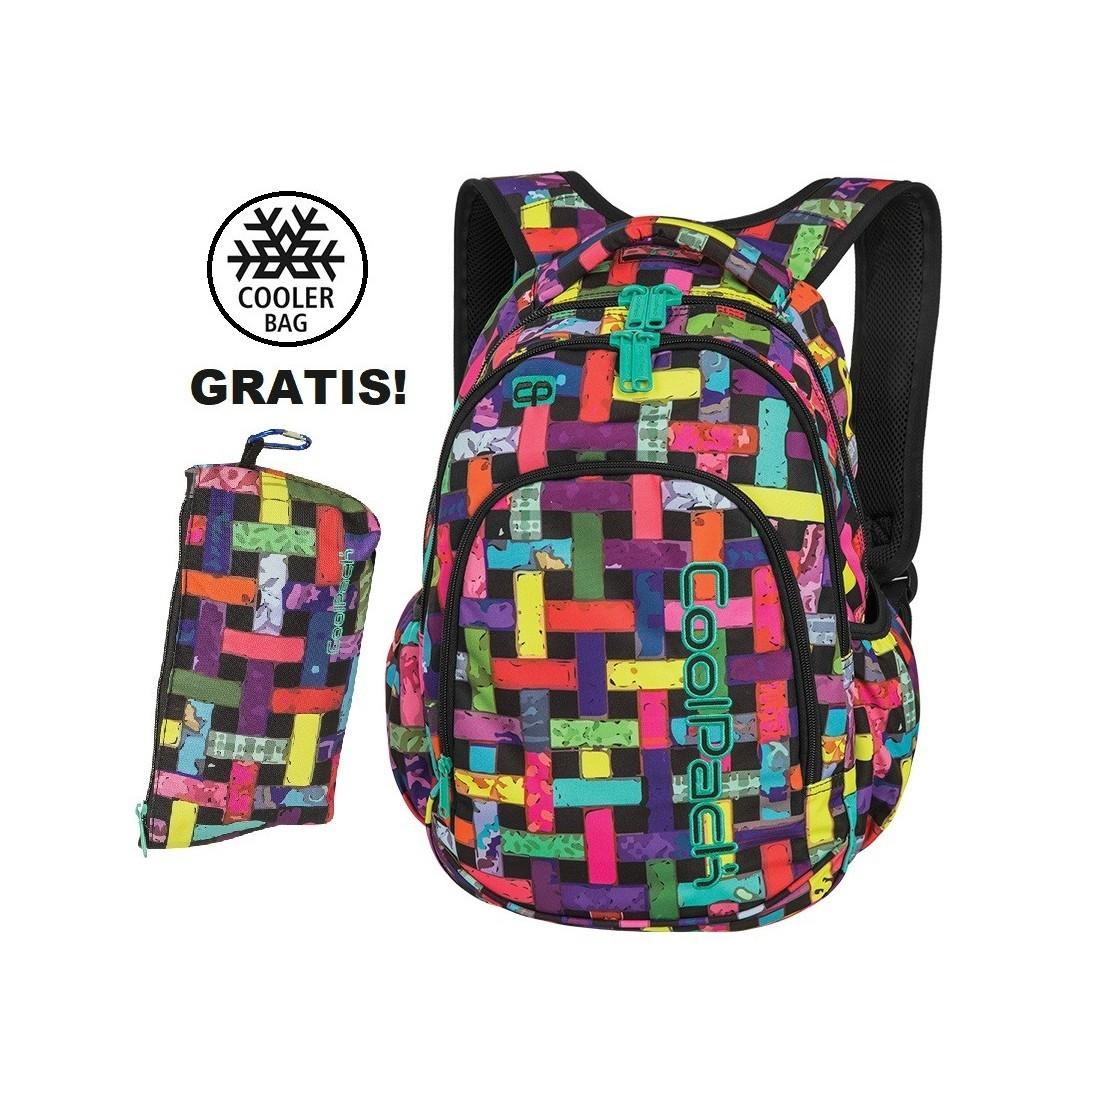 b798cf72972d0 Plecak szkolny (do klas 1-3) CoolPack CP PRIME RIBBON GRID kolorowe wstążki